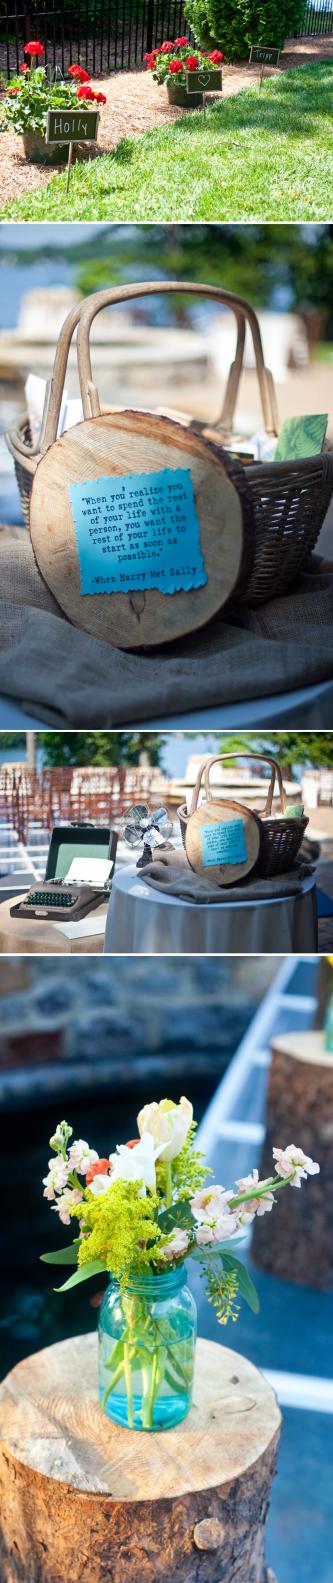 real wedding turquoise color palette mason jar reception centerpieces